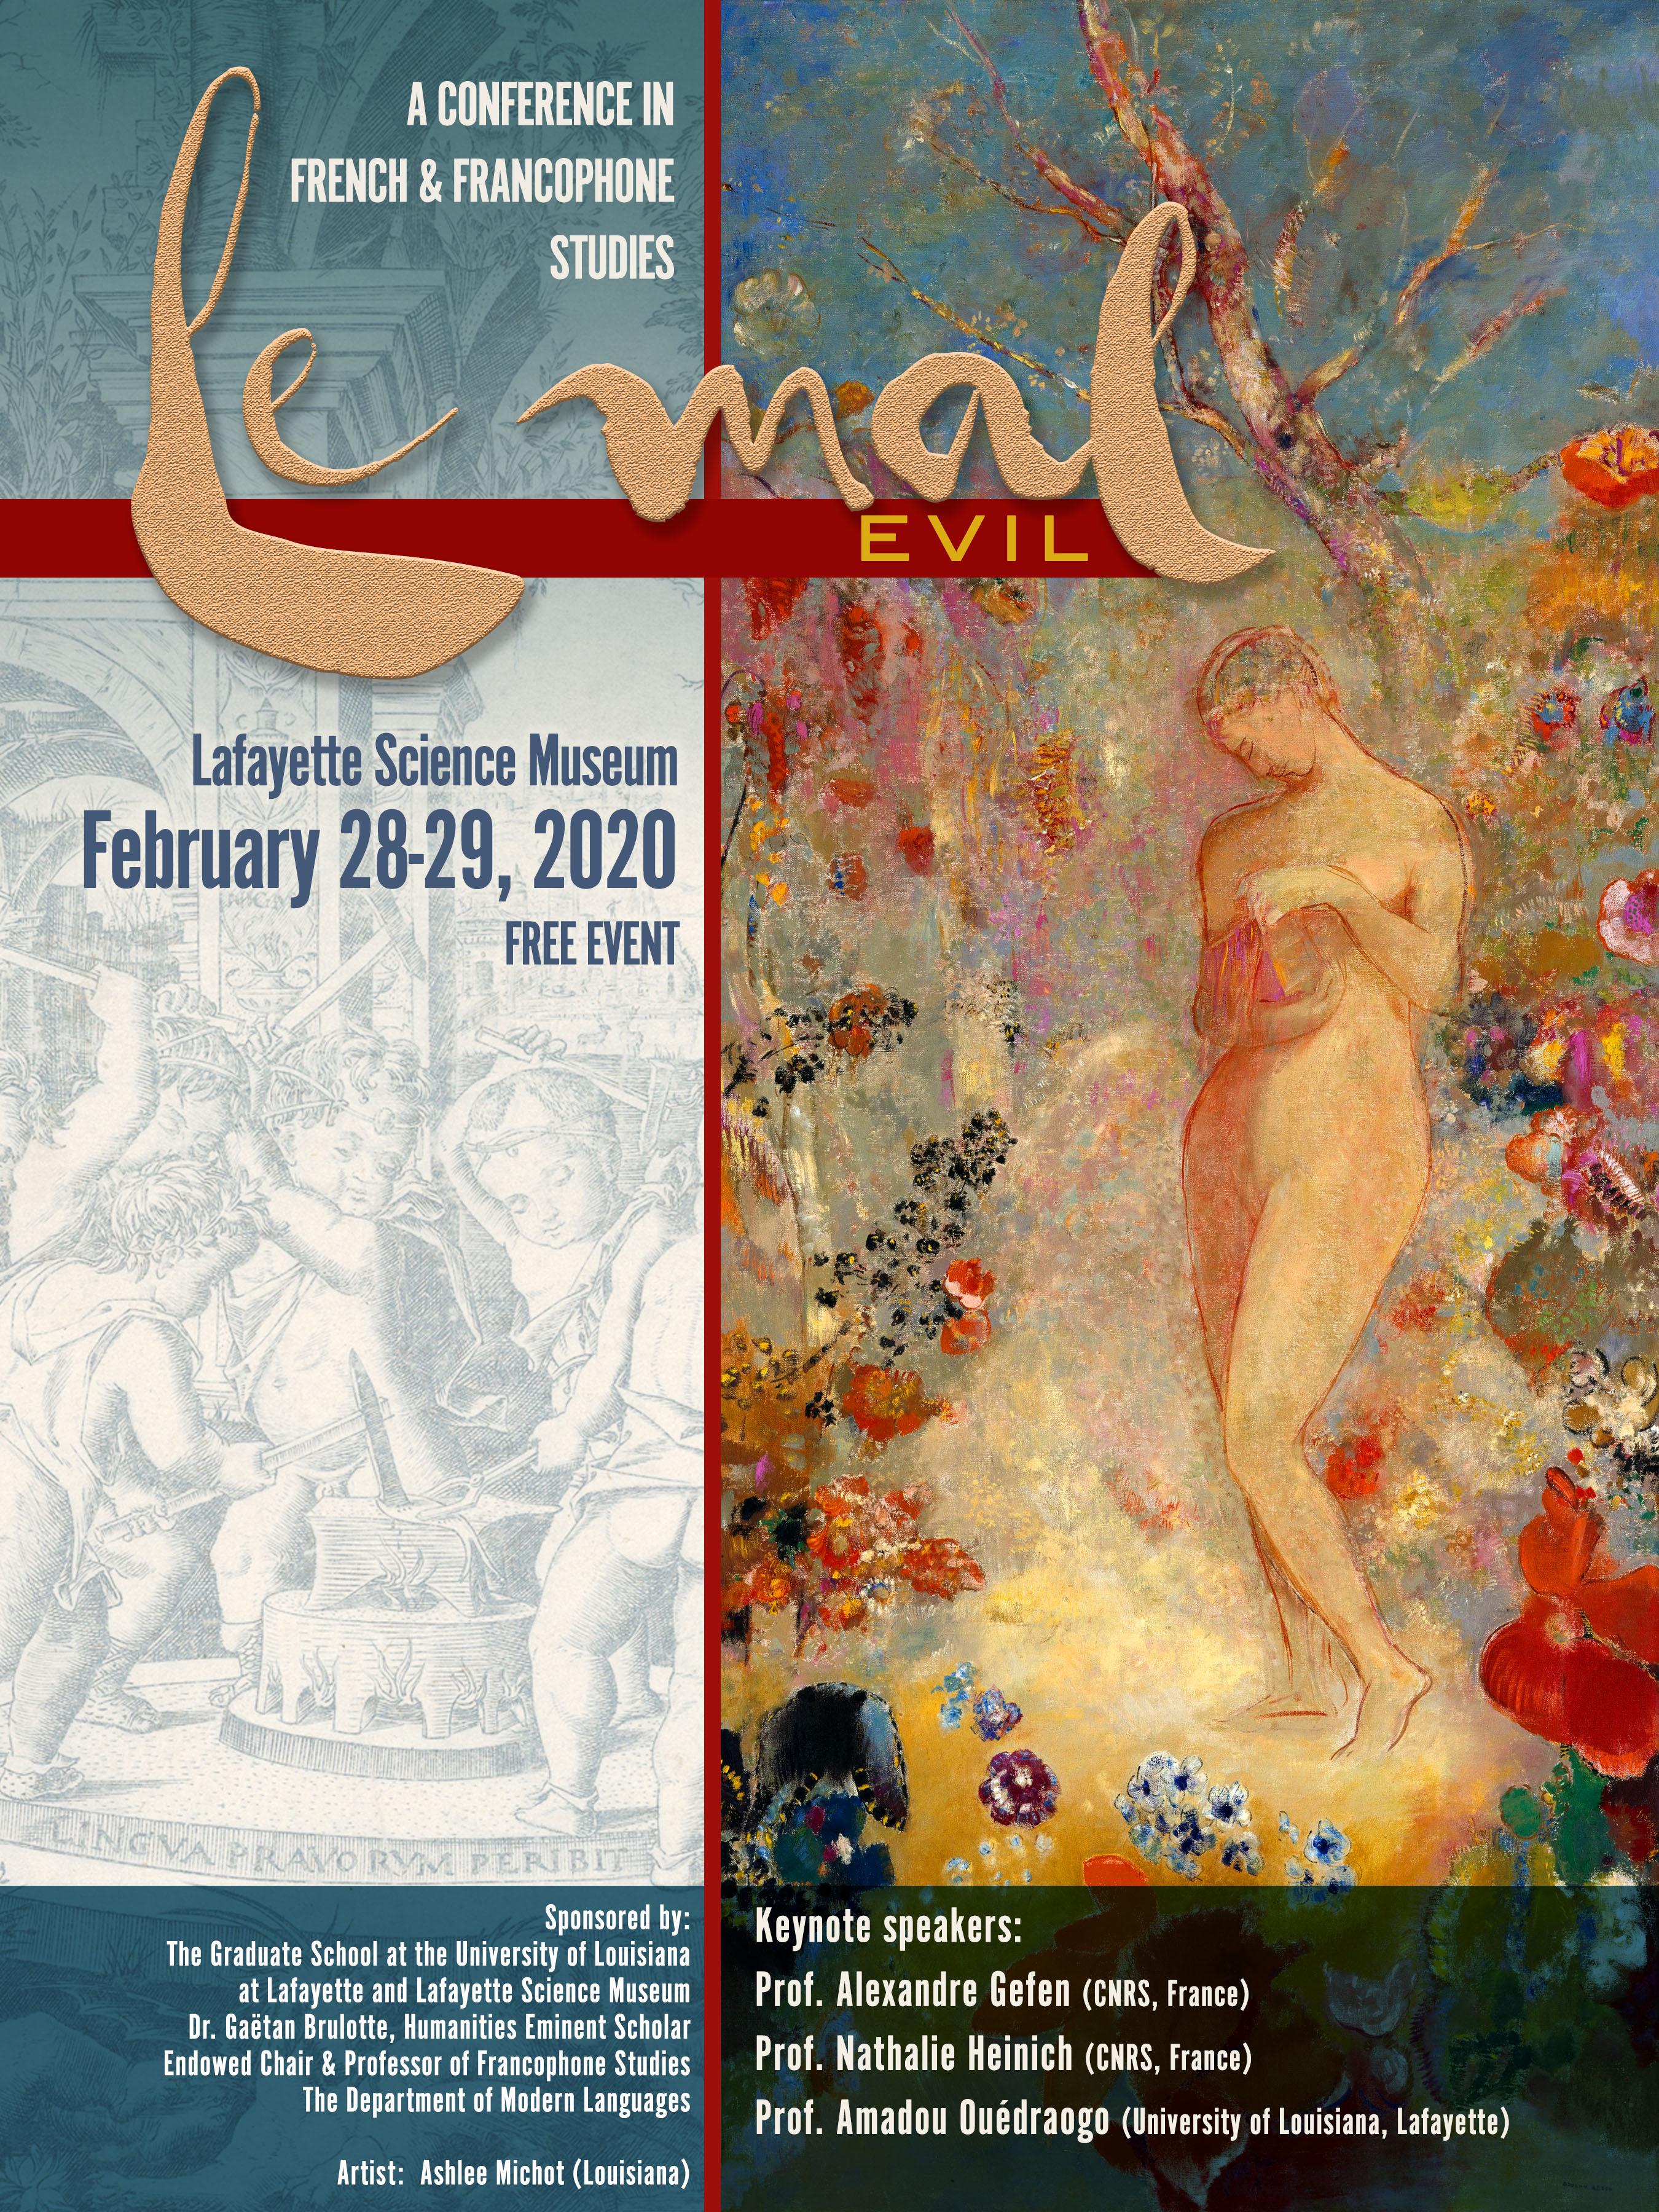 Le Mal/Evil (Lafayette Science Museum, Louisiane)